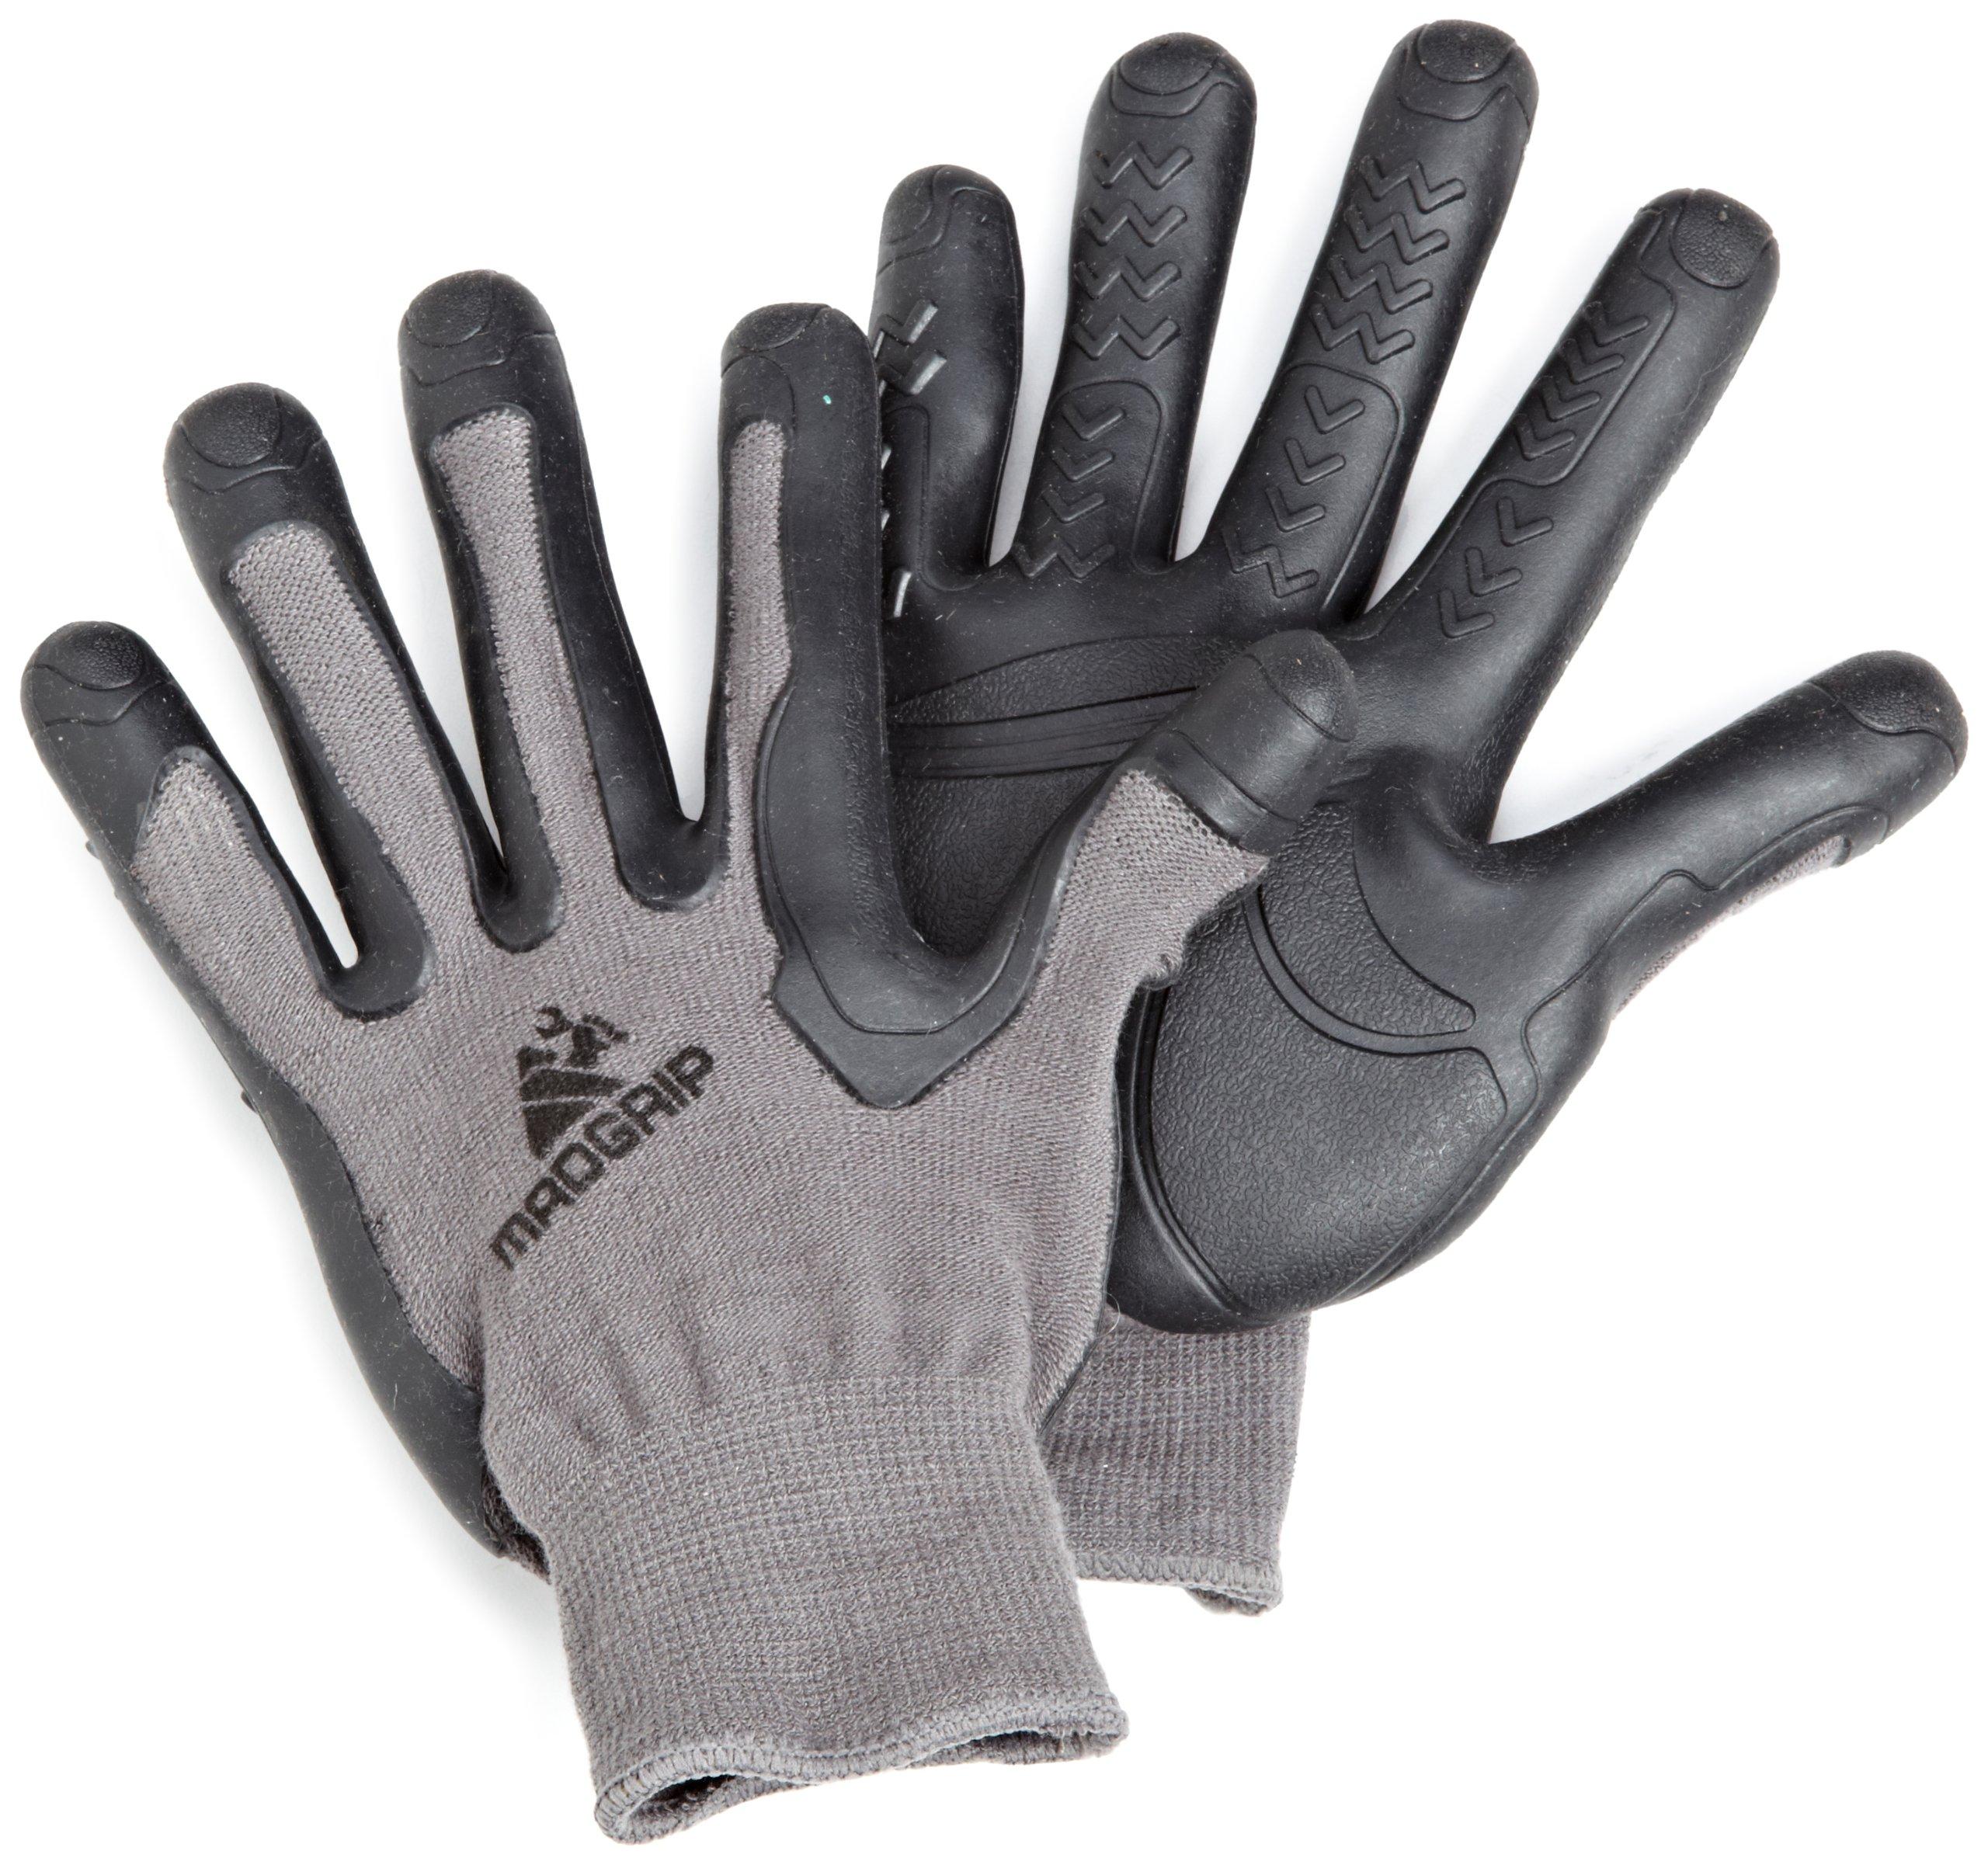 Mad Grip F100 Pro Palm Gloves